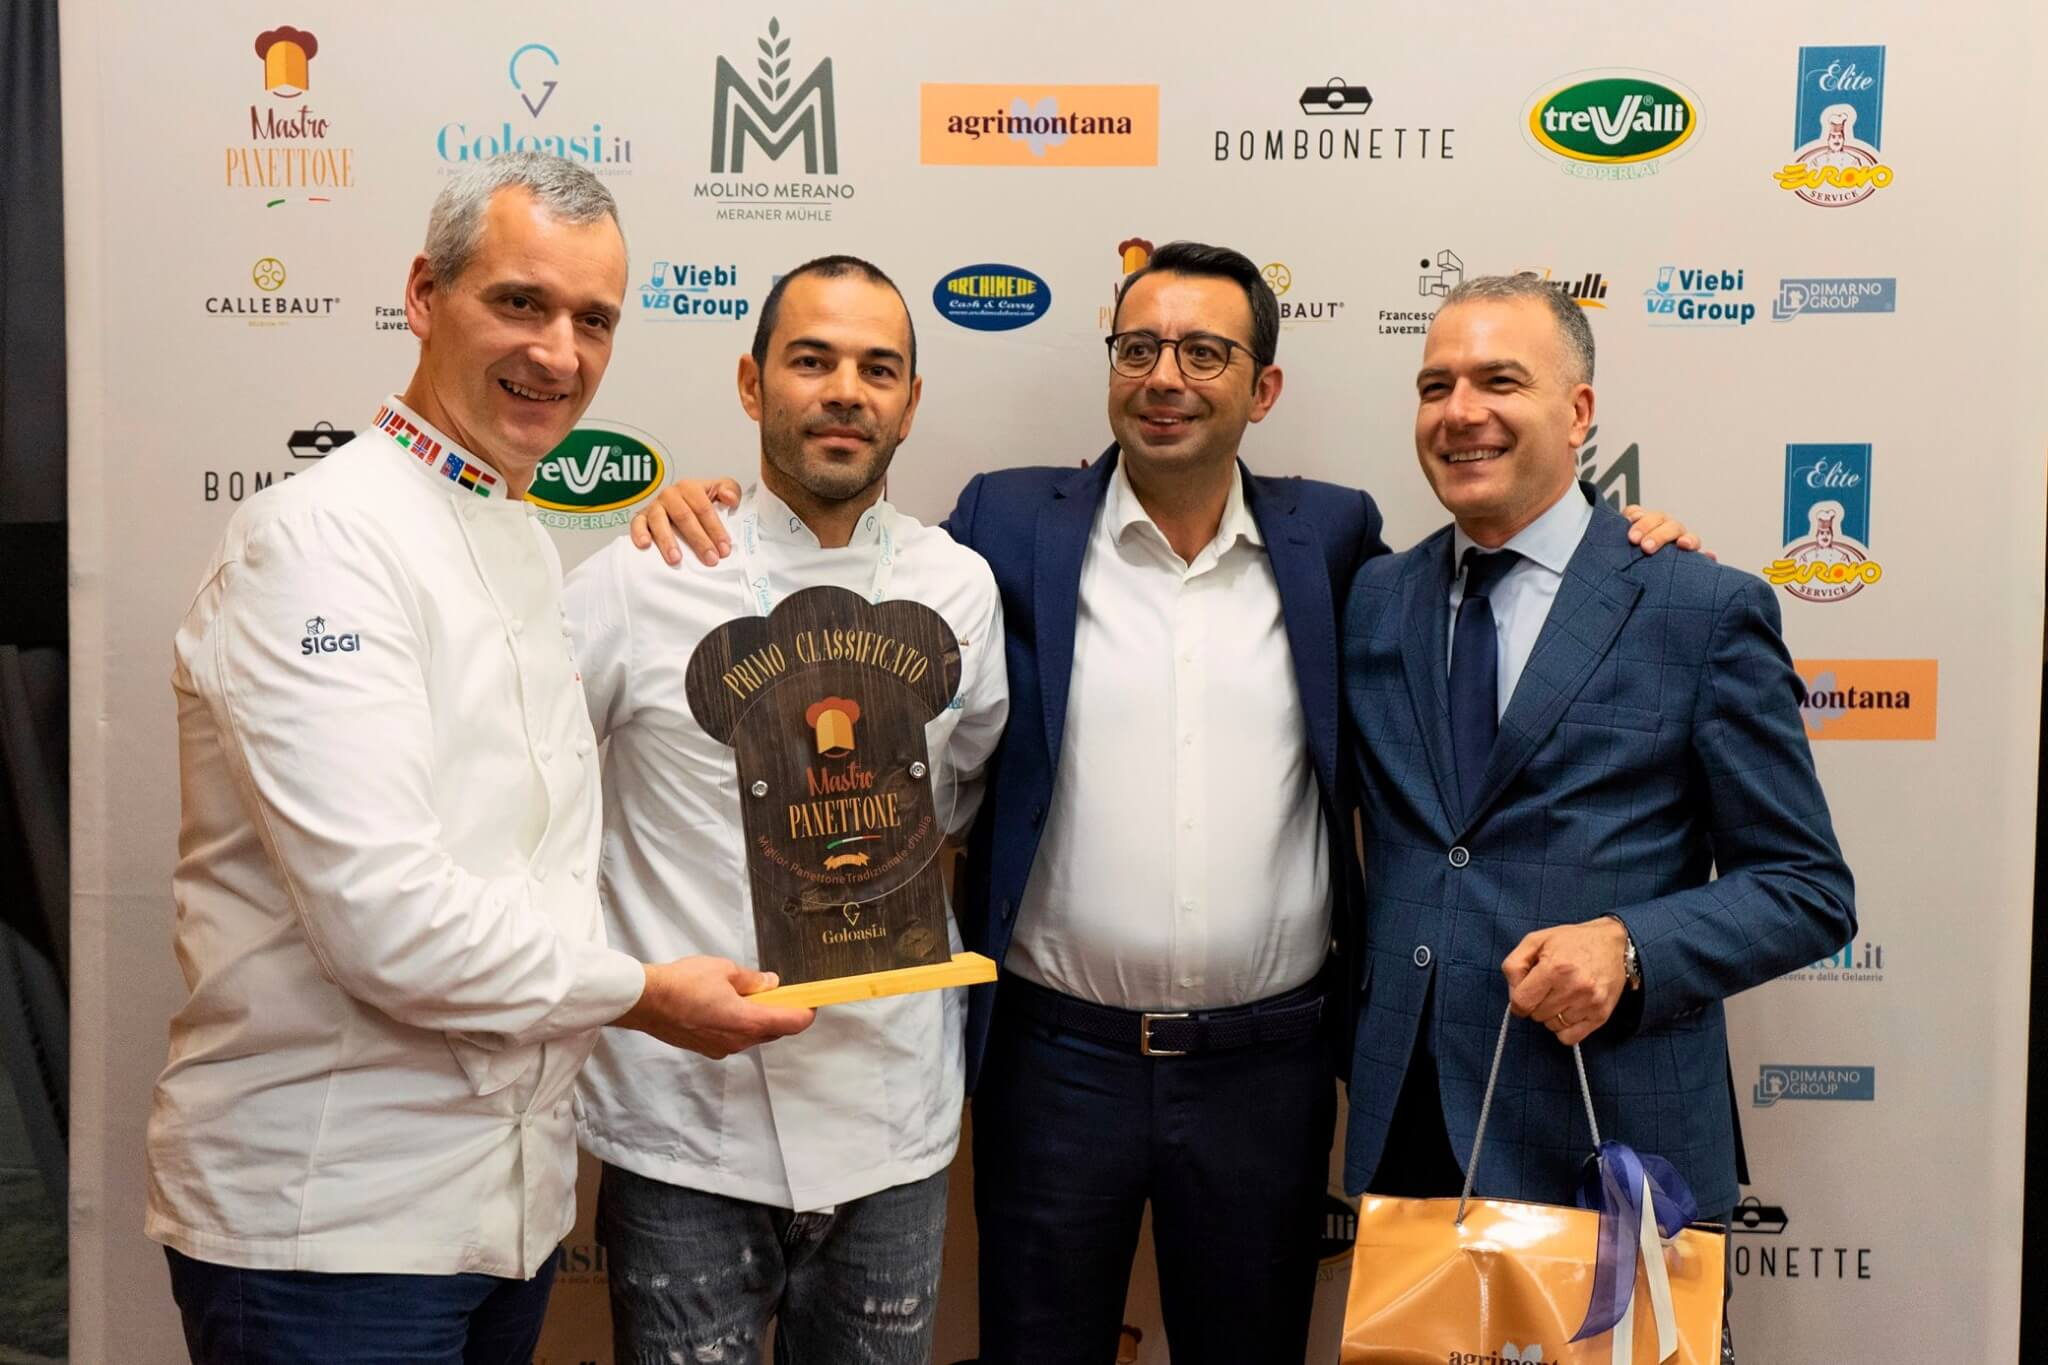 Mastro Panettone 2019 - Goloasi - Dolceria Sapone - Eustachio Sapone 5